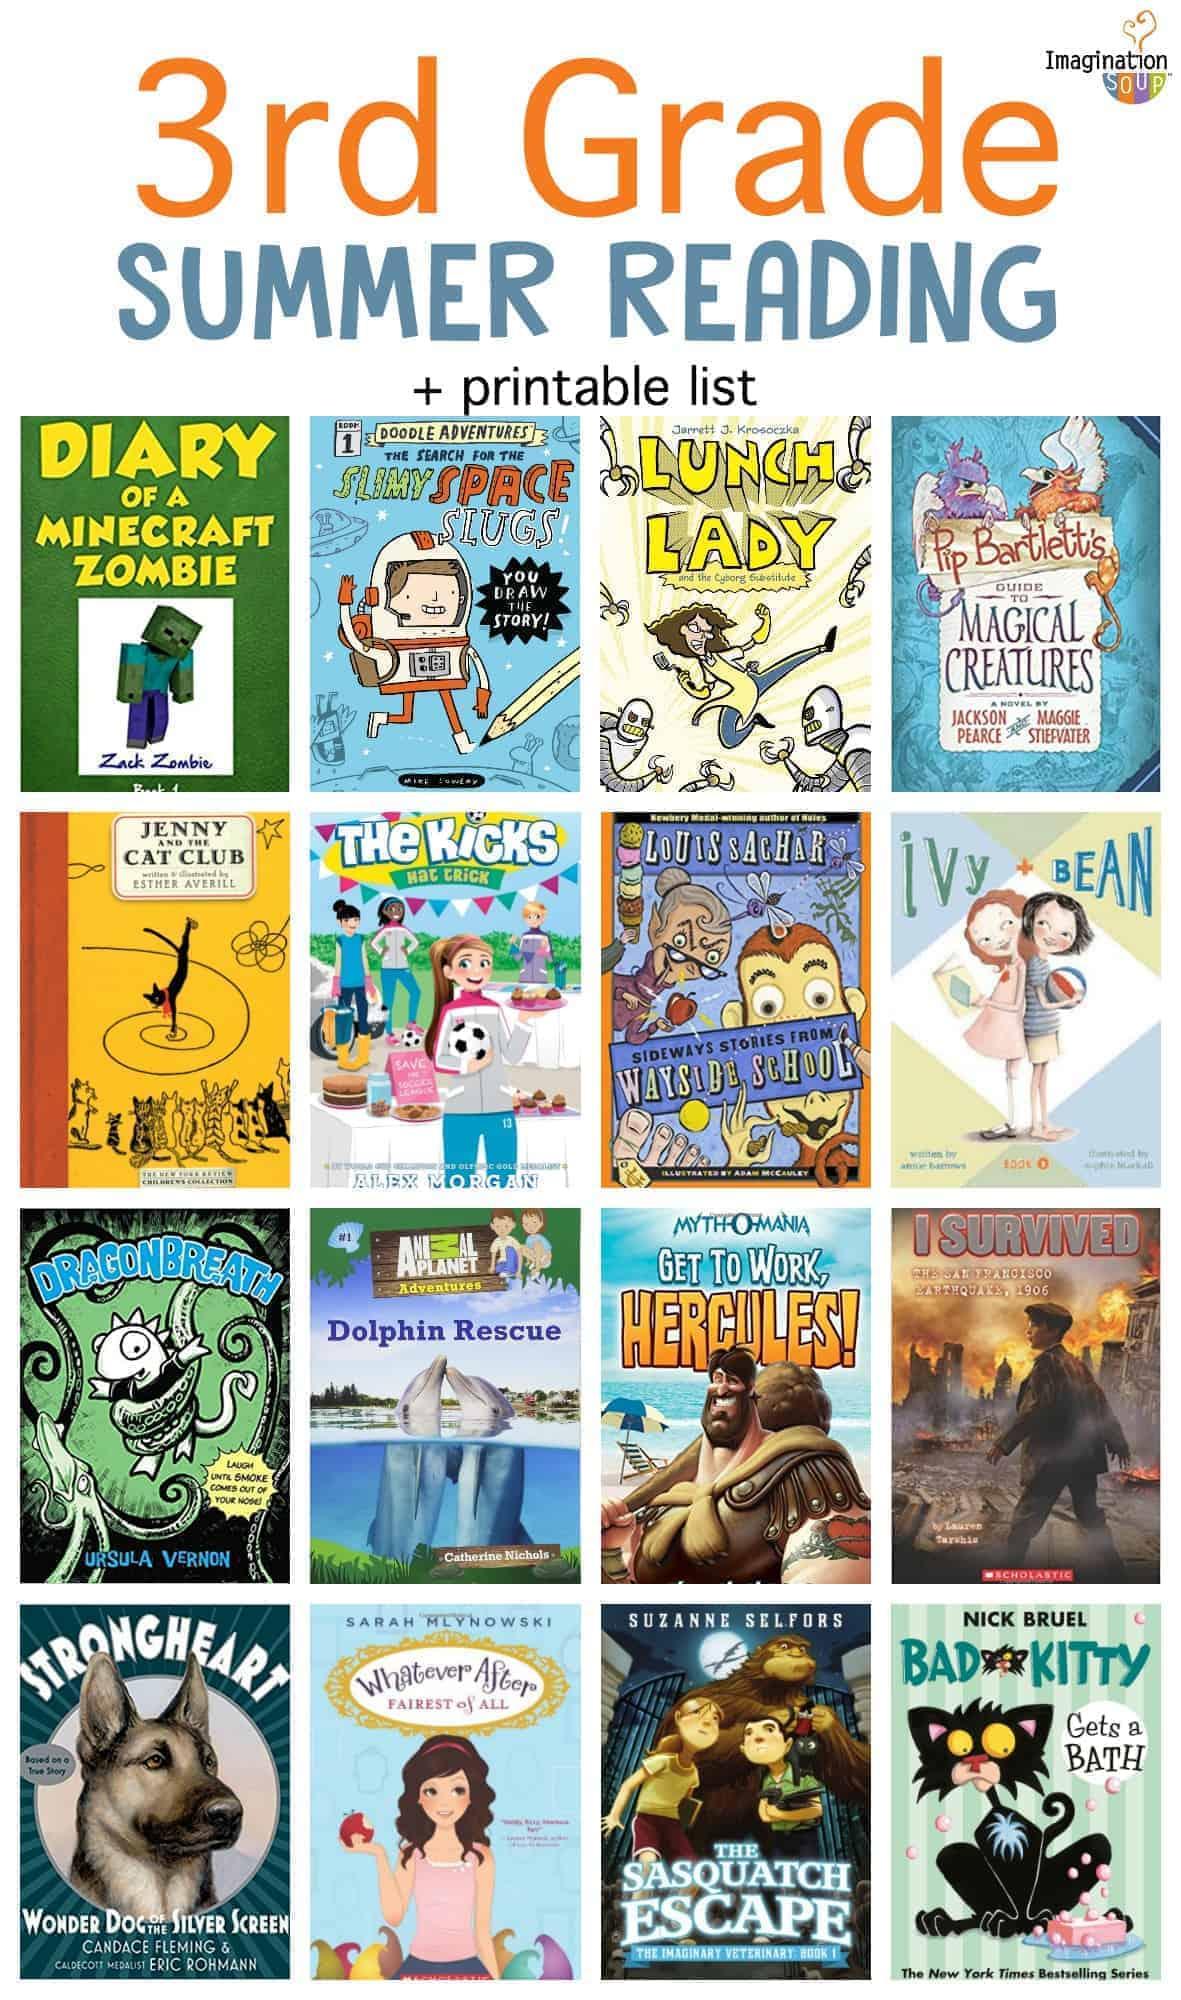 3rd grade summer reading list plus printable